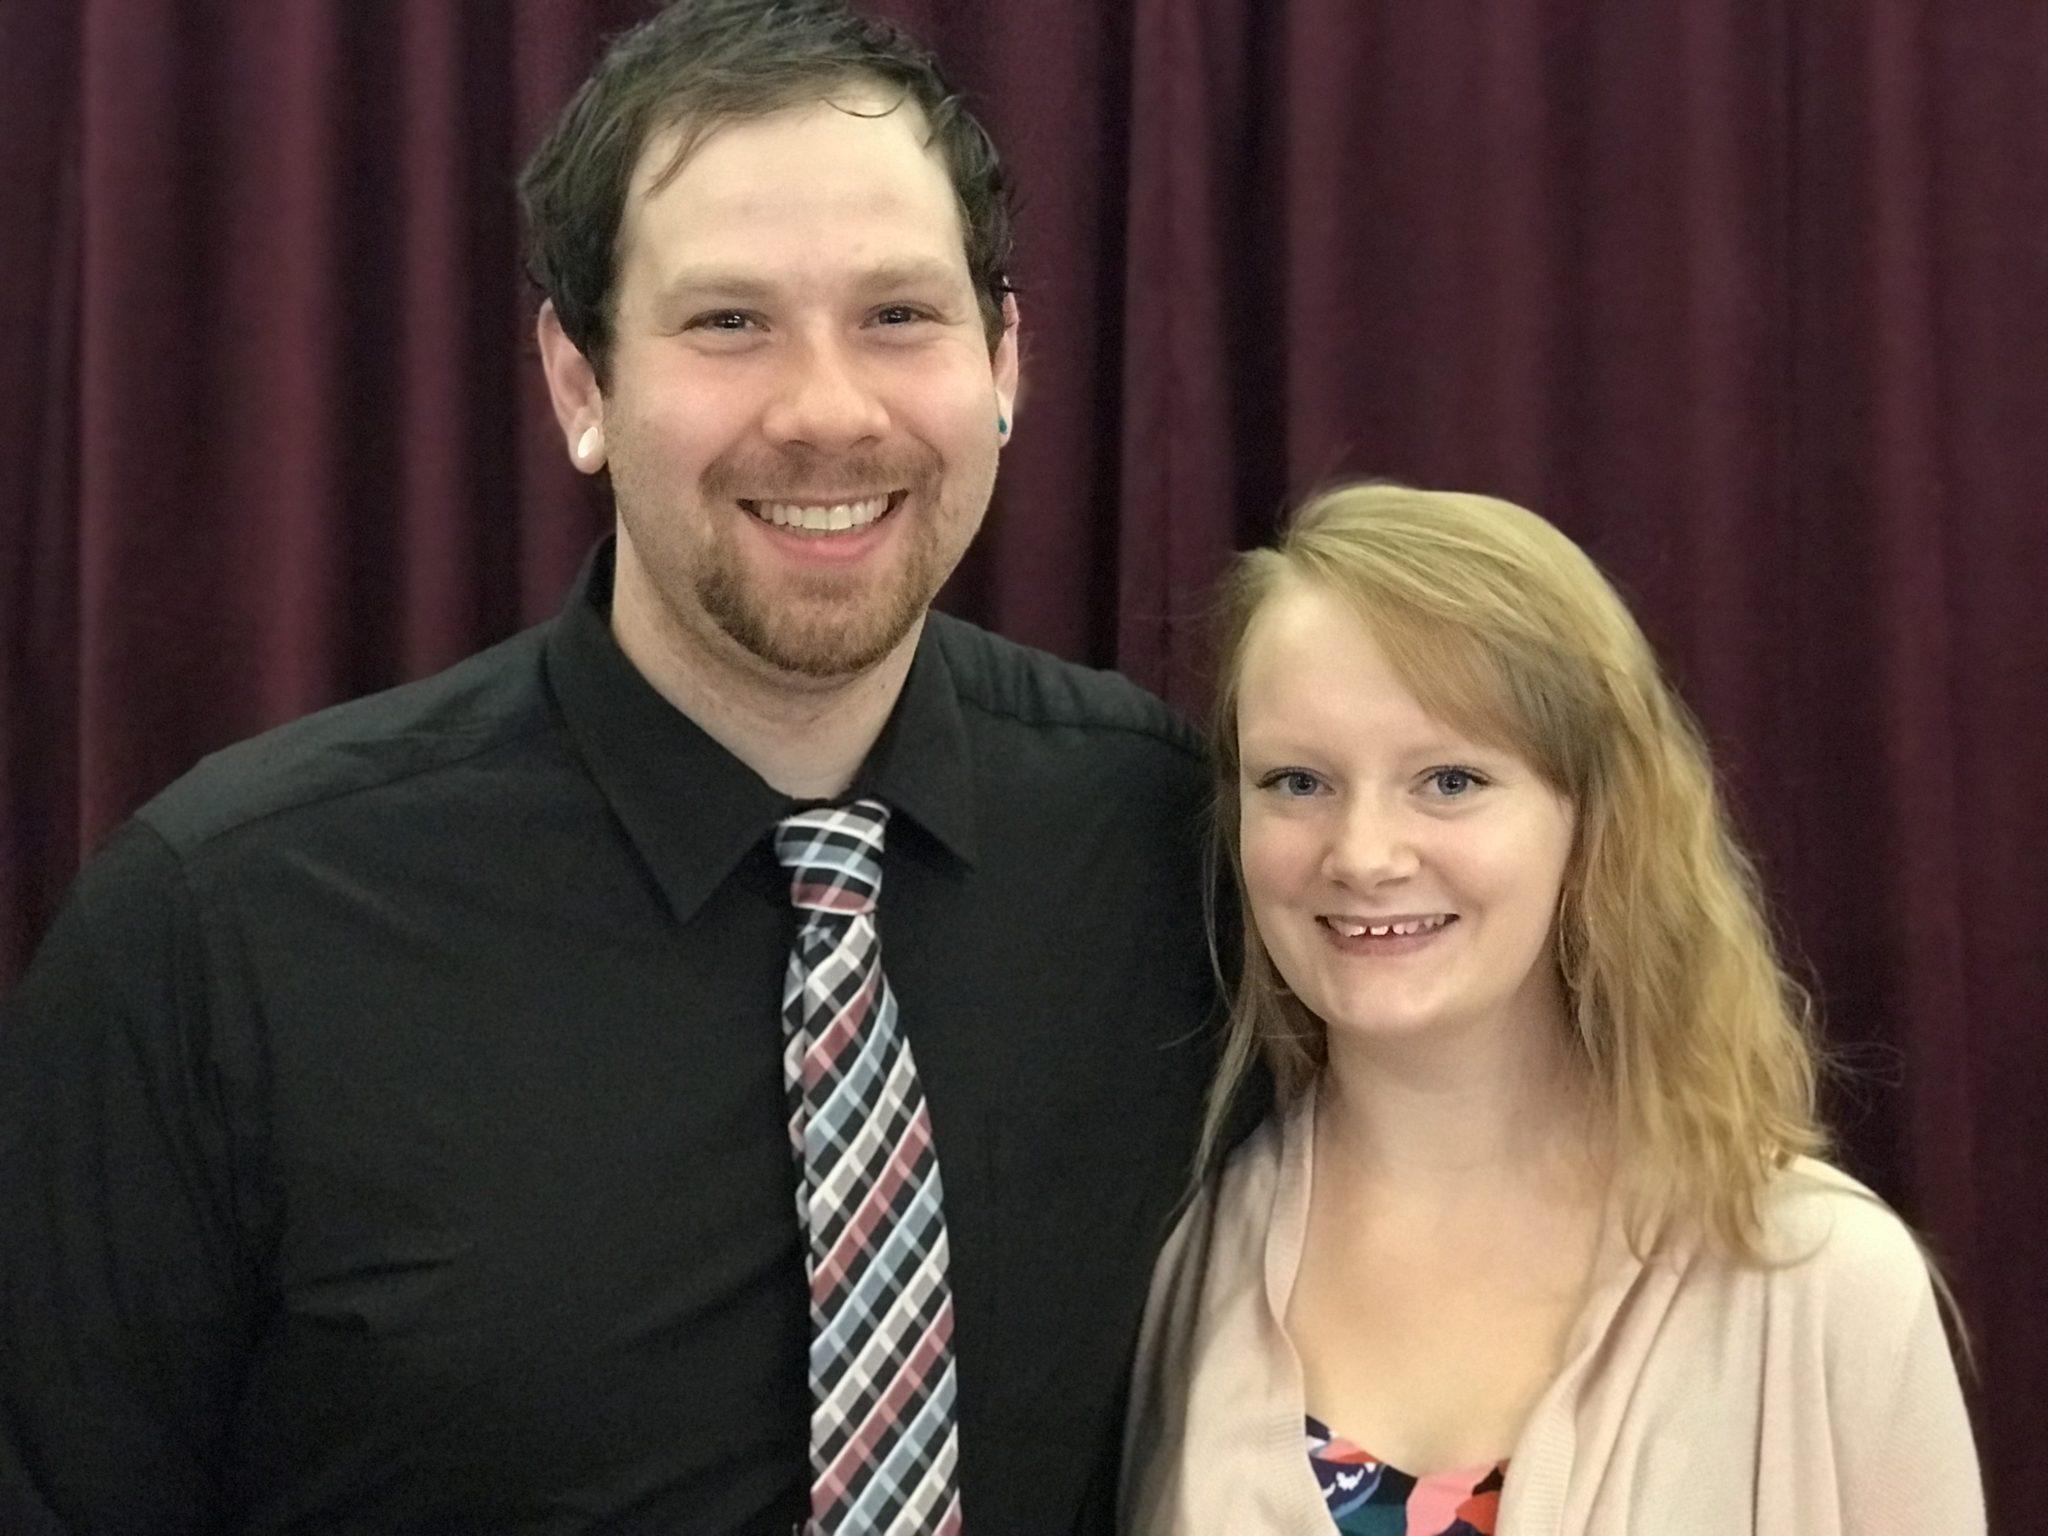 Jeremiah Mace & Youth Pastor Kristin Mace.